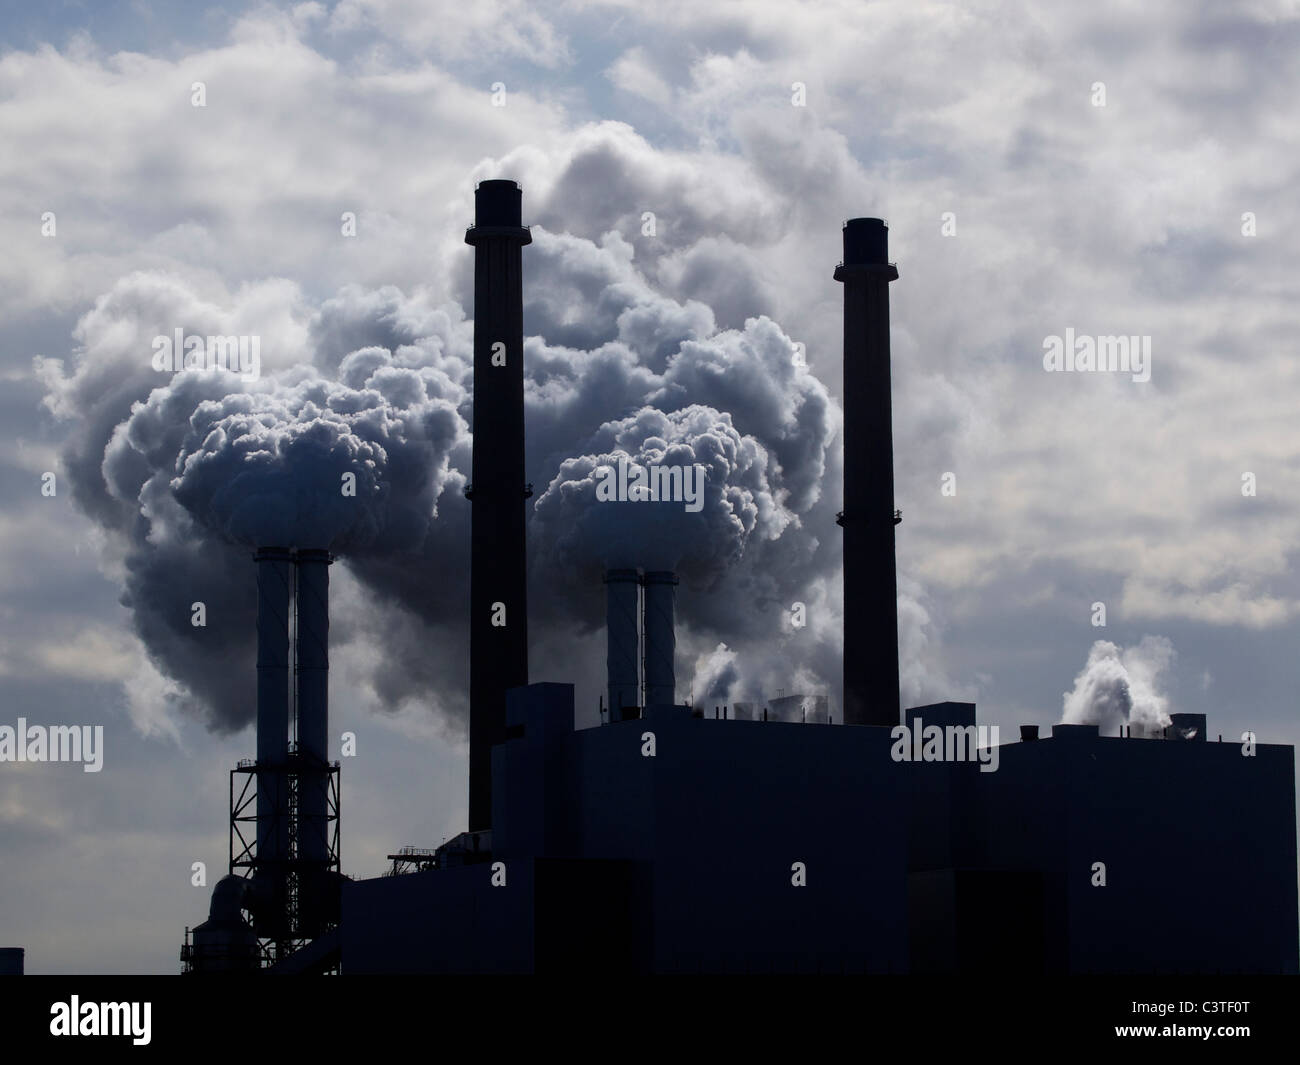 smoke stacks with lots of smoke, E-on powerplant Maasvlakte, Port of rotterdam, the Netherlands - Stock Image